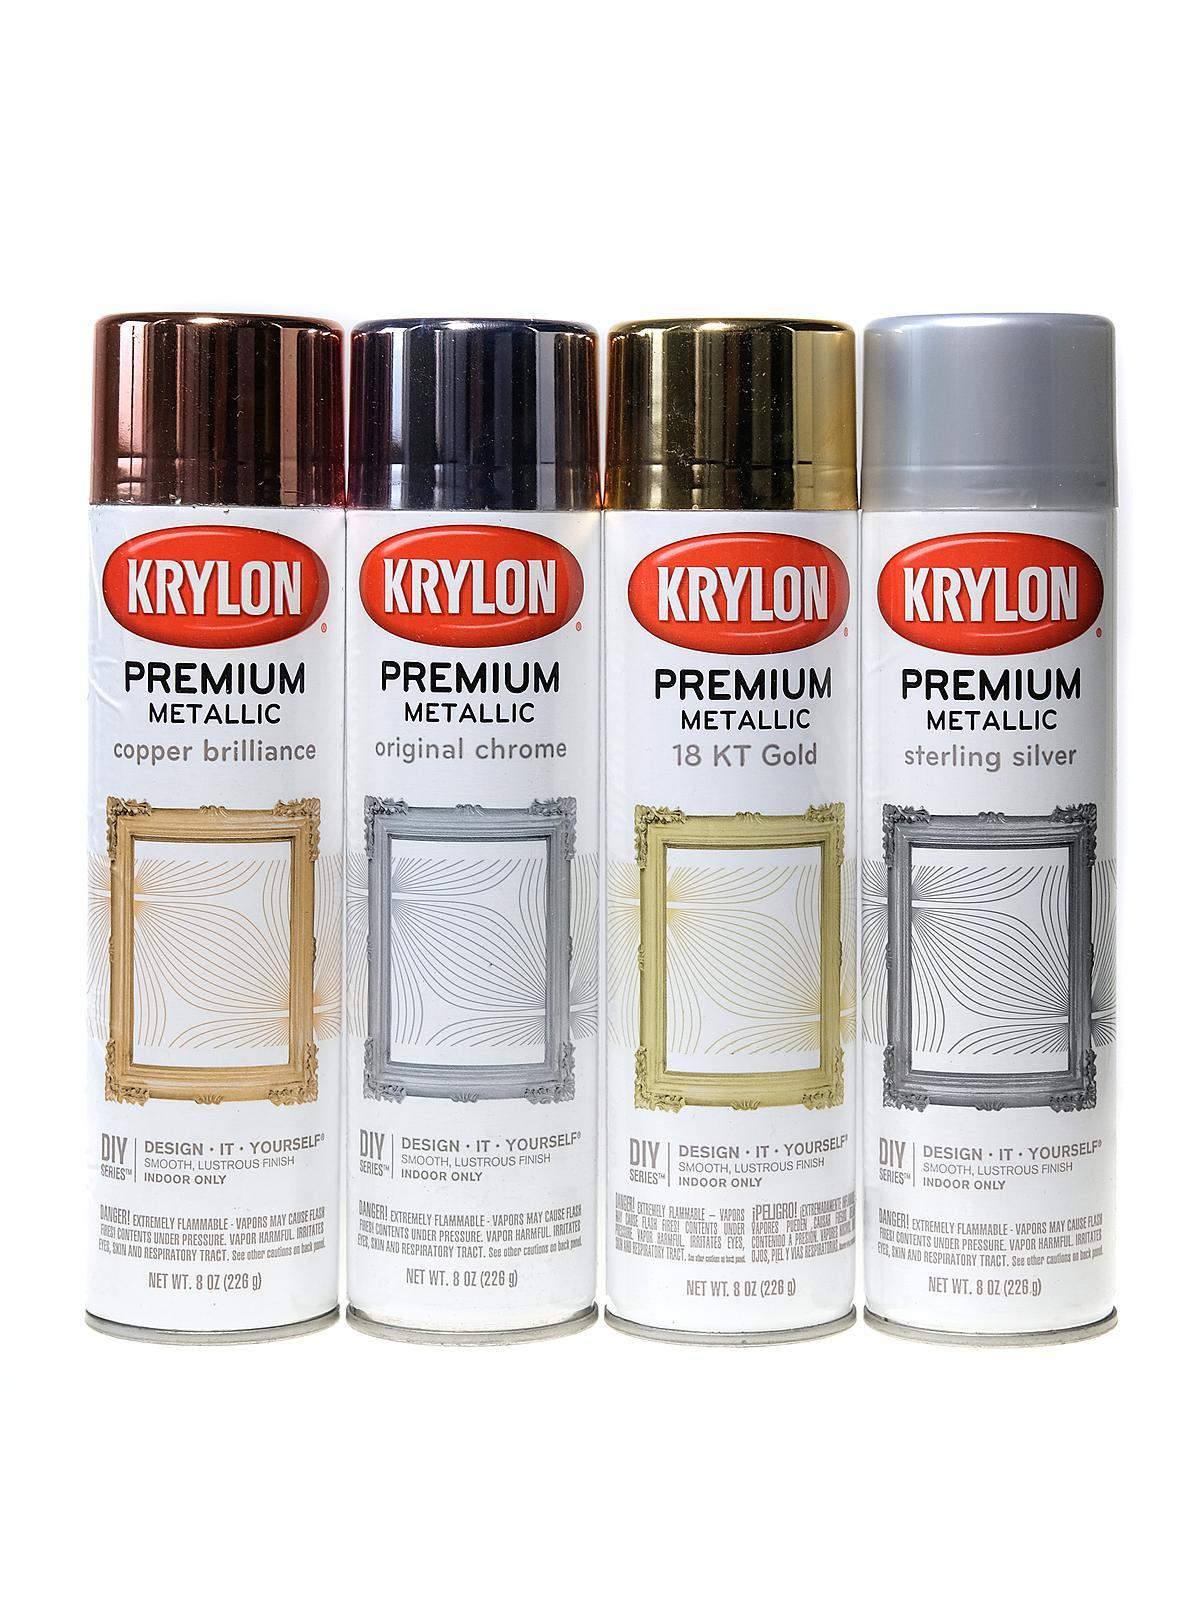 is krylon spray paint food safe | Foodstutorial org